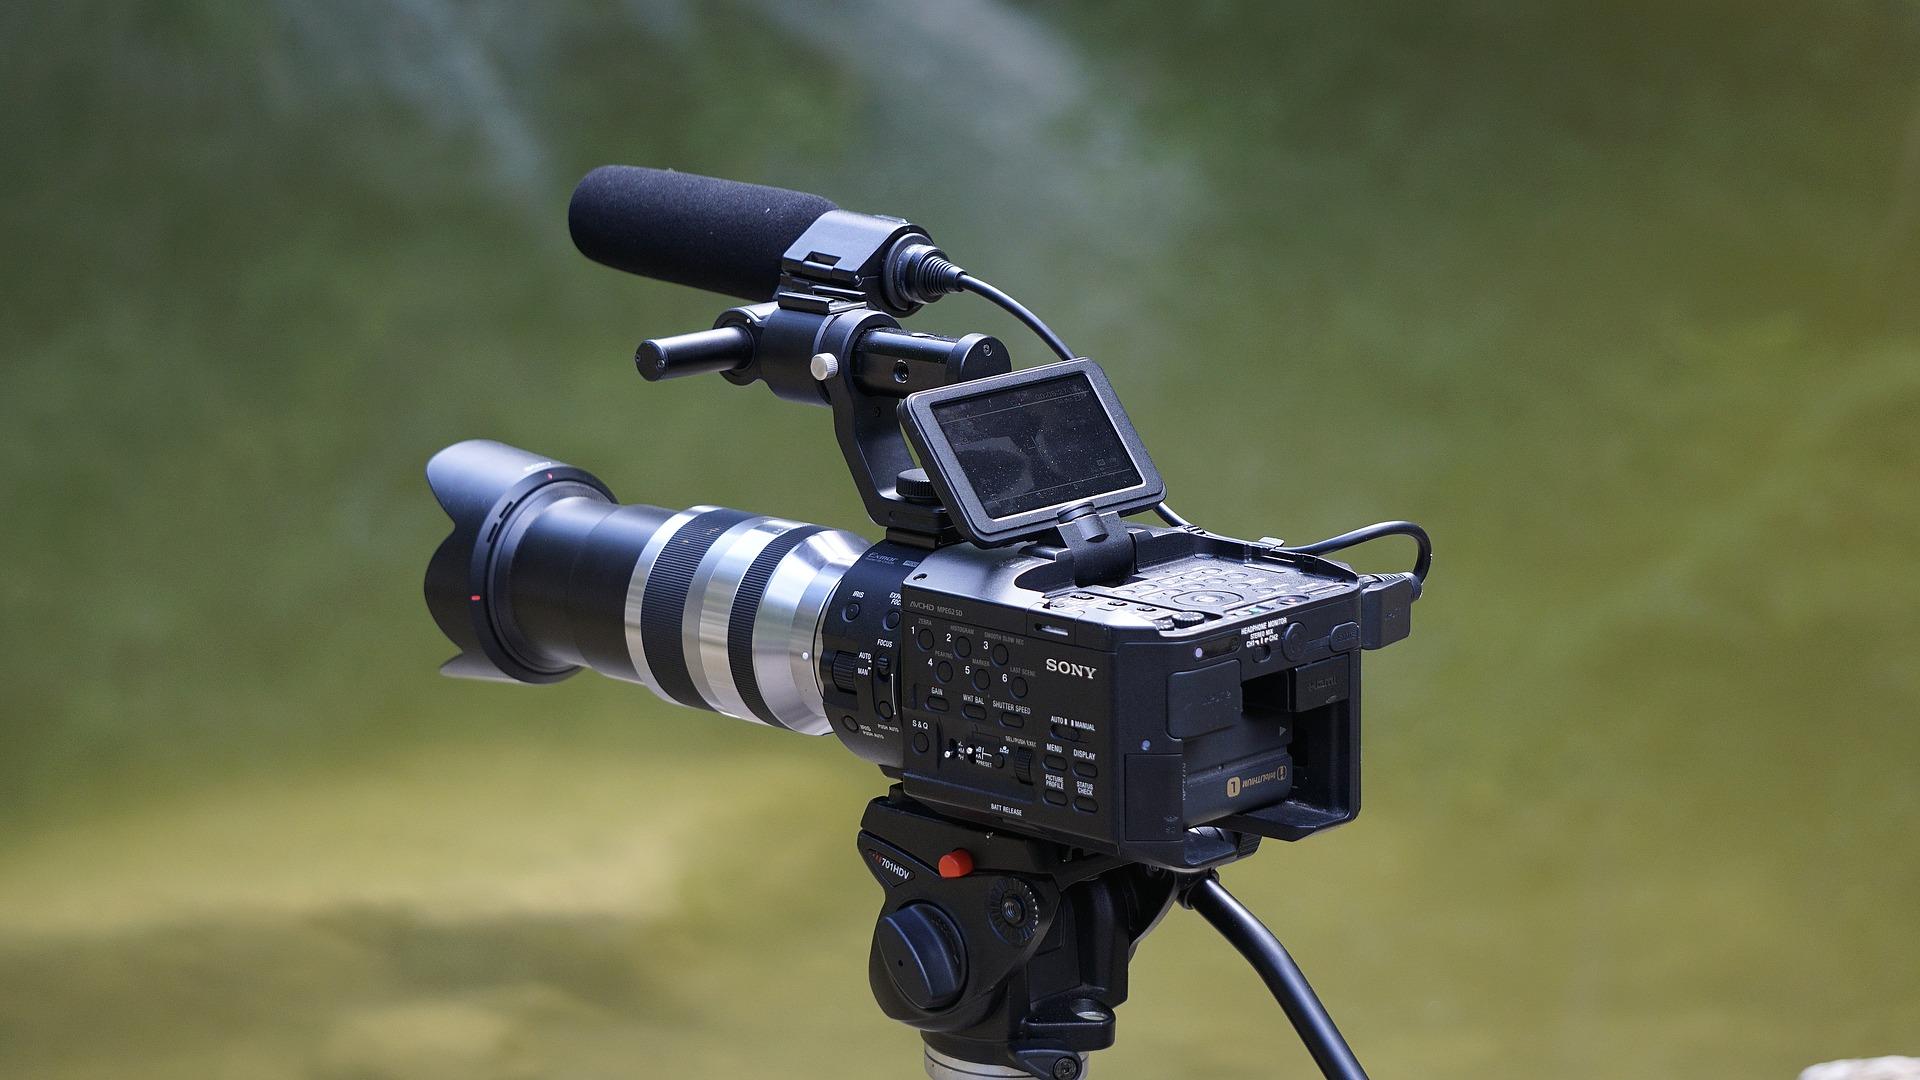 Photo & Videoshooting